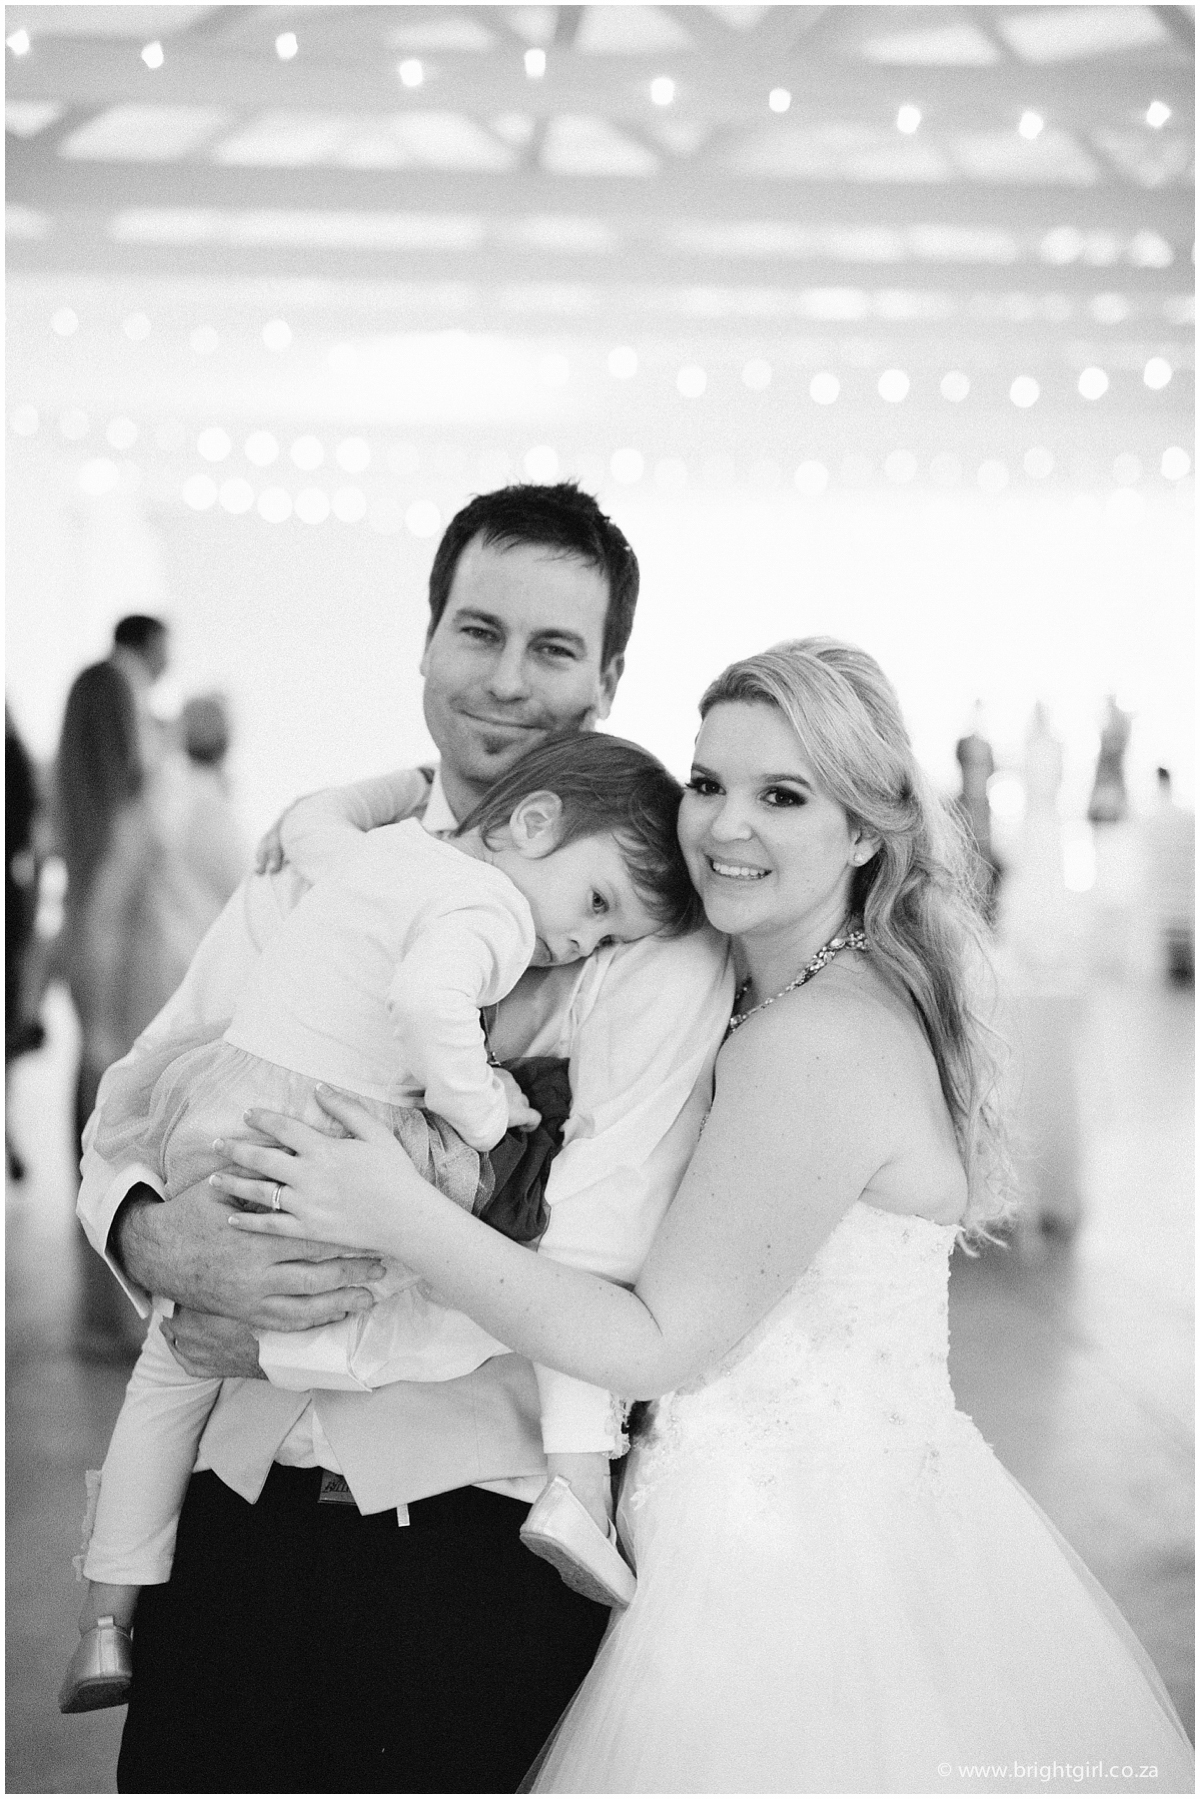 talloula-wedding-tarryn-chris-65